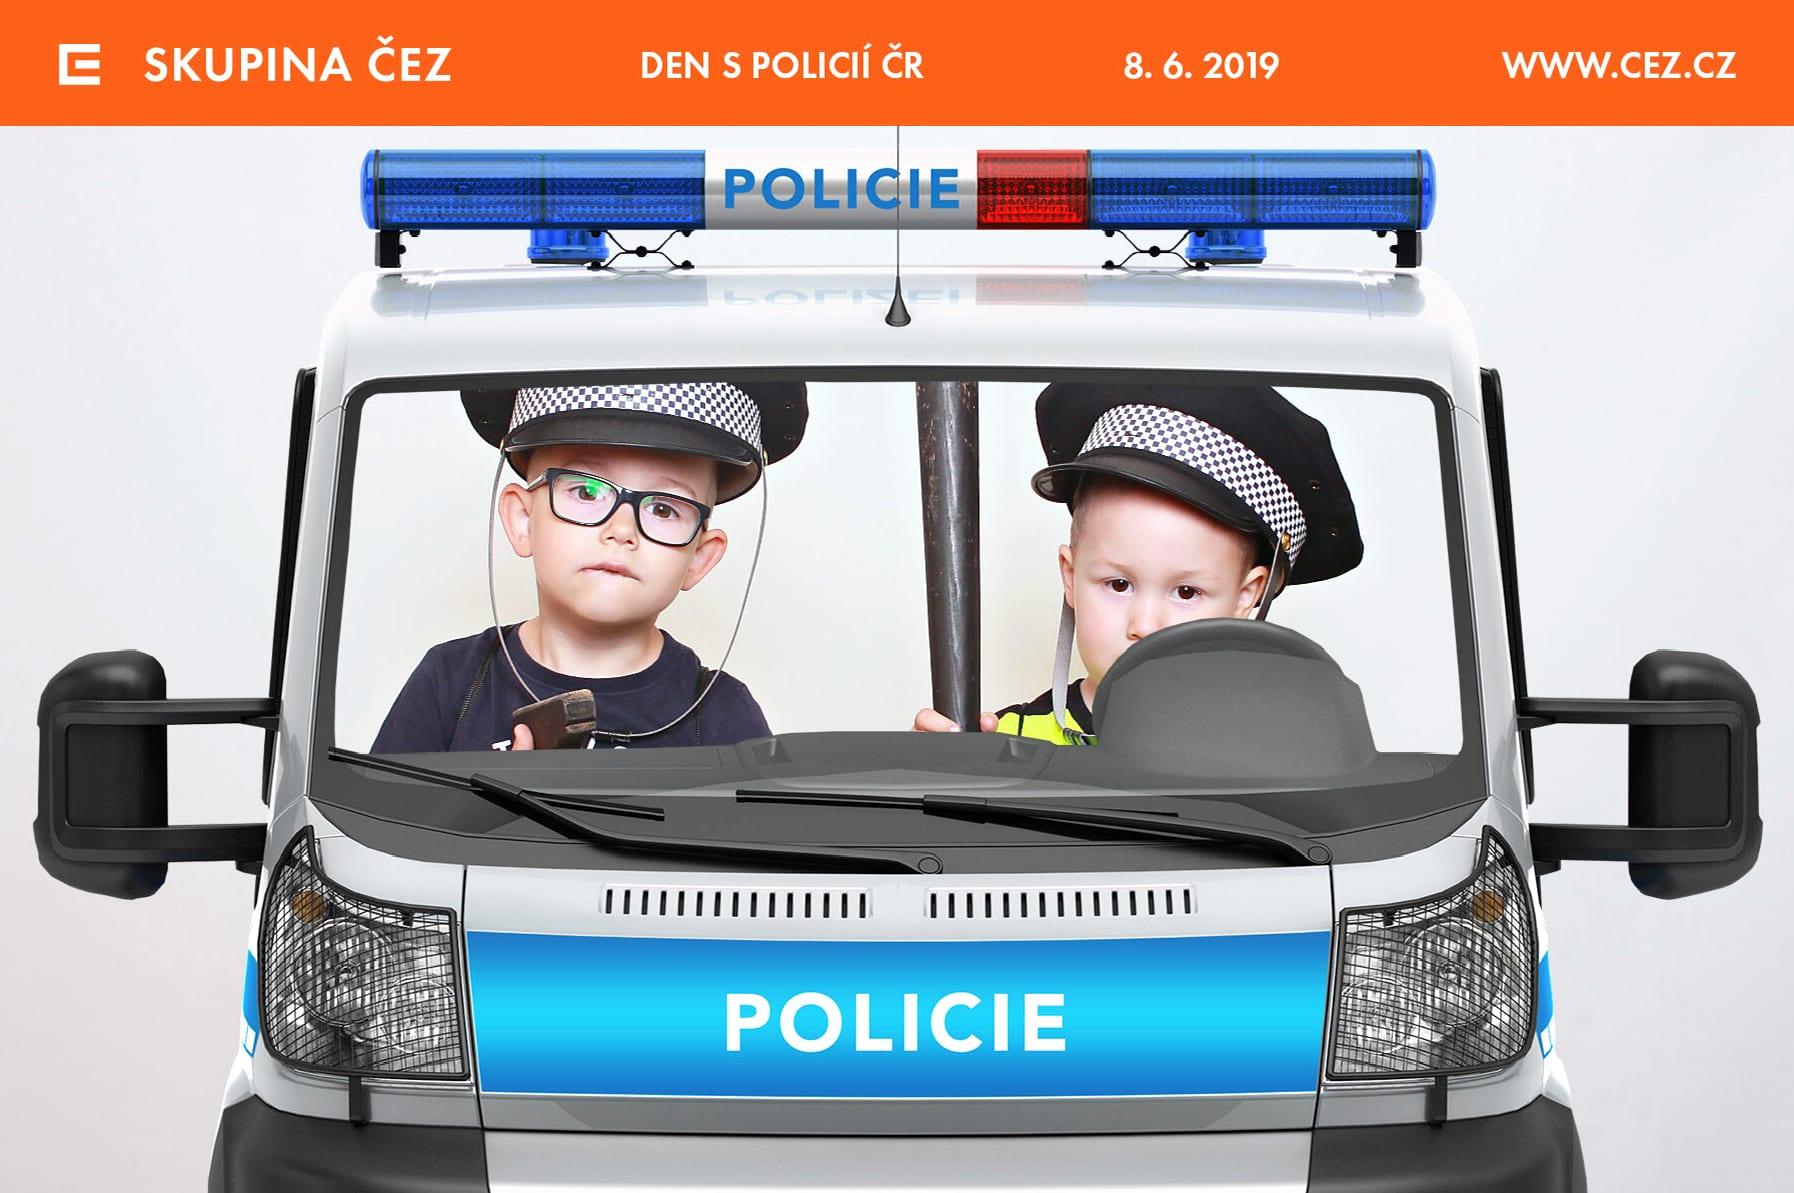 fotokoutek-praha-promo-akce-cez-den-s-policii-8-6-2019-622353